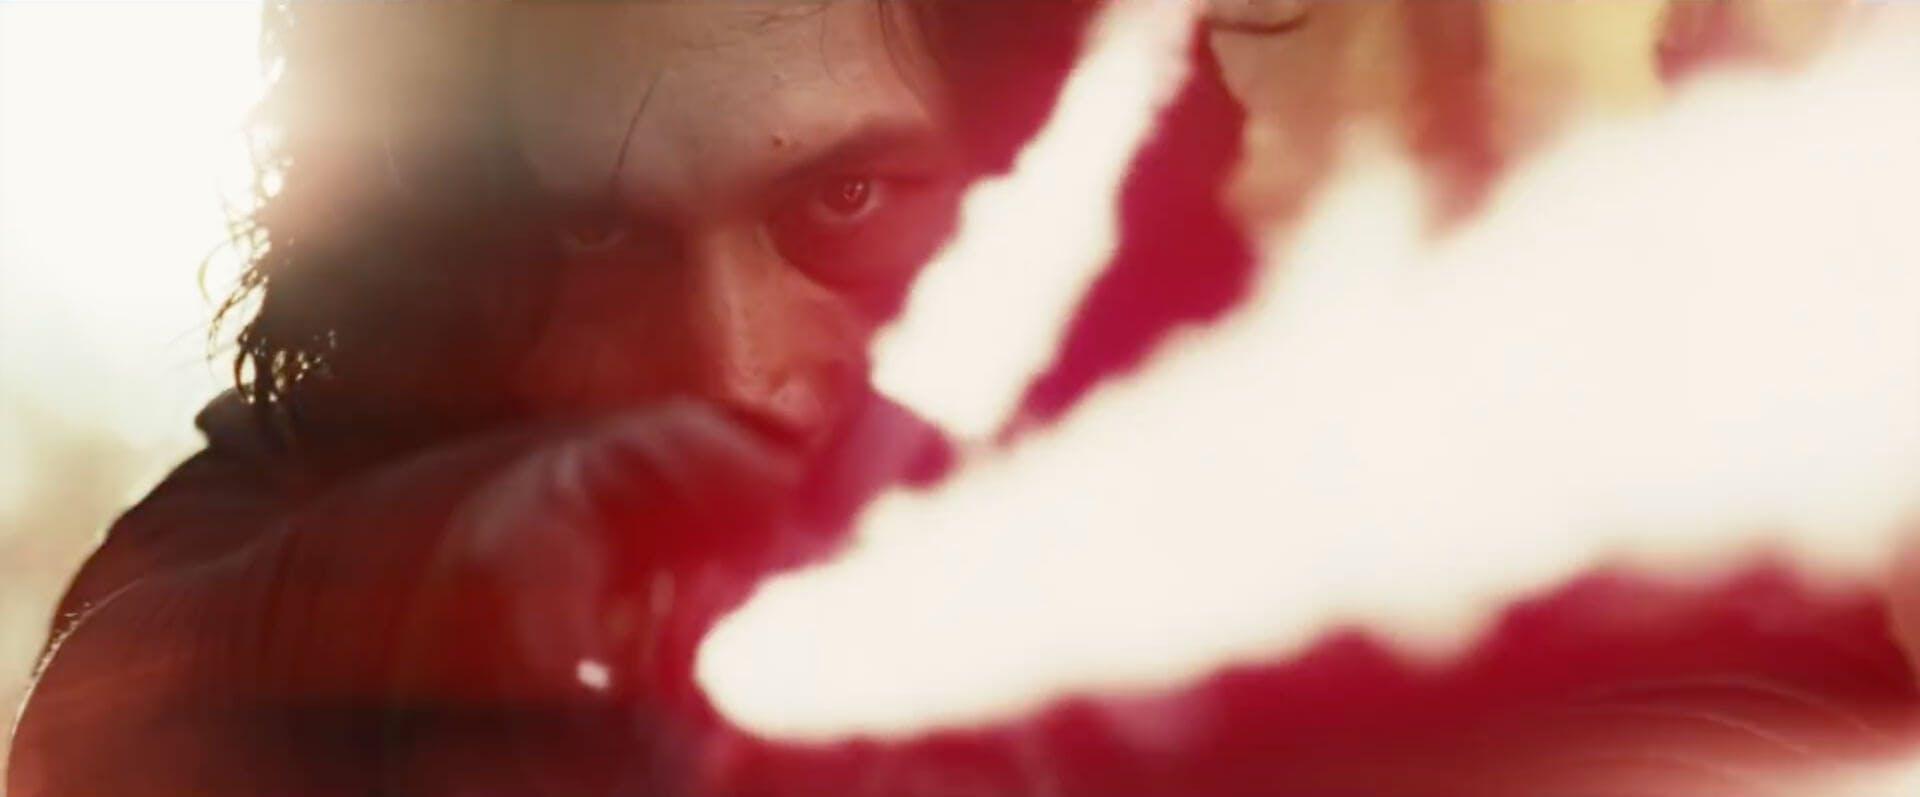 The Force Awakens - Kylo Ren star wars movies